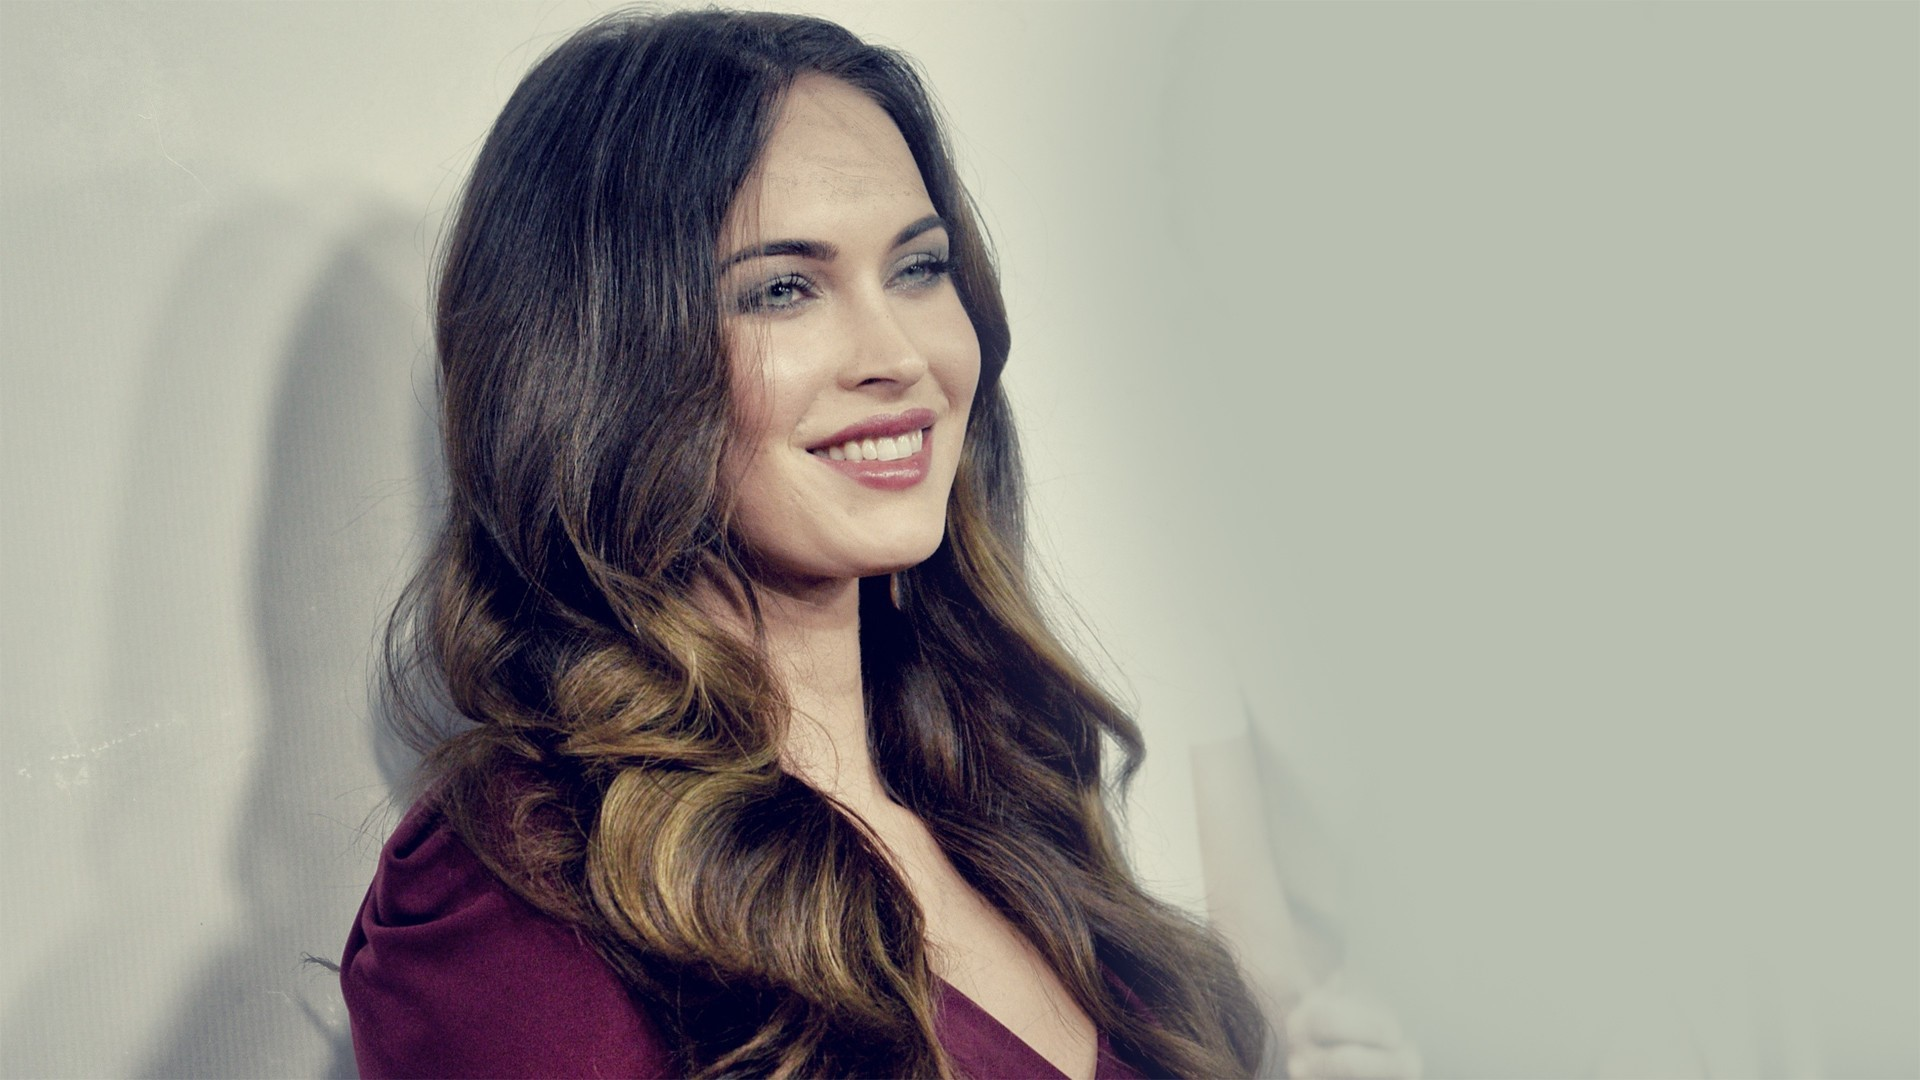 Megan Fox Background images